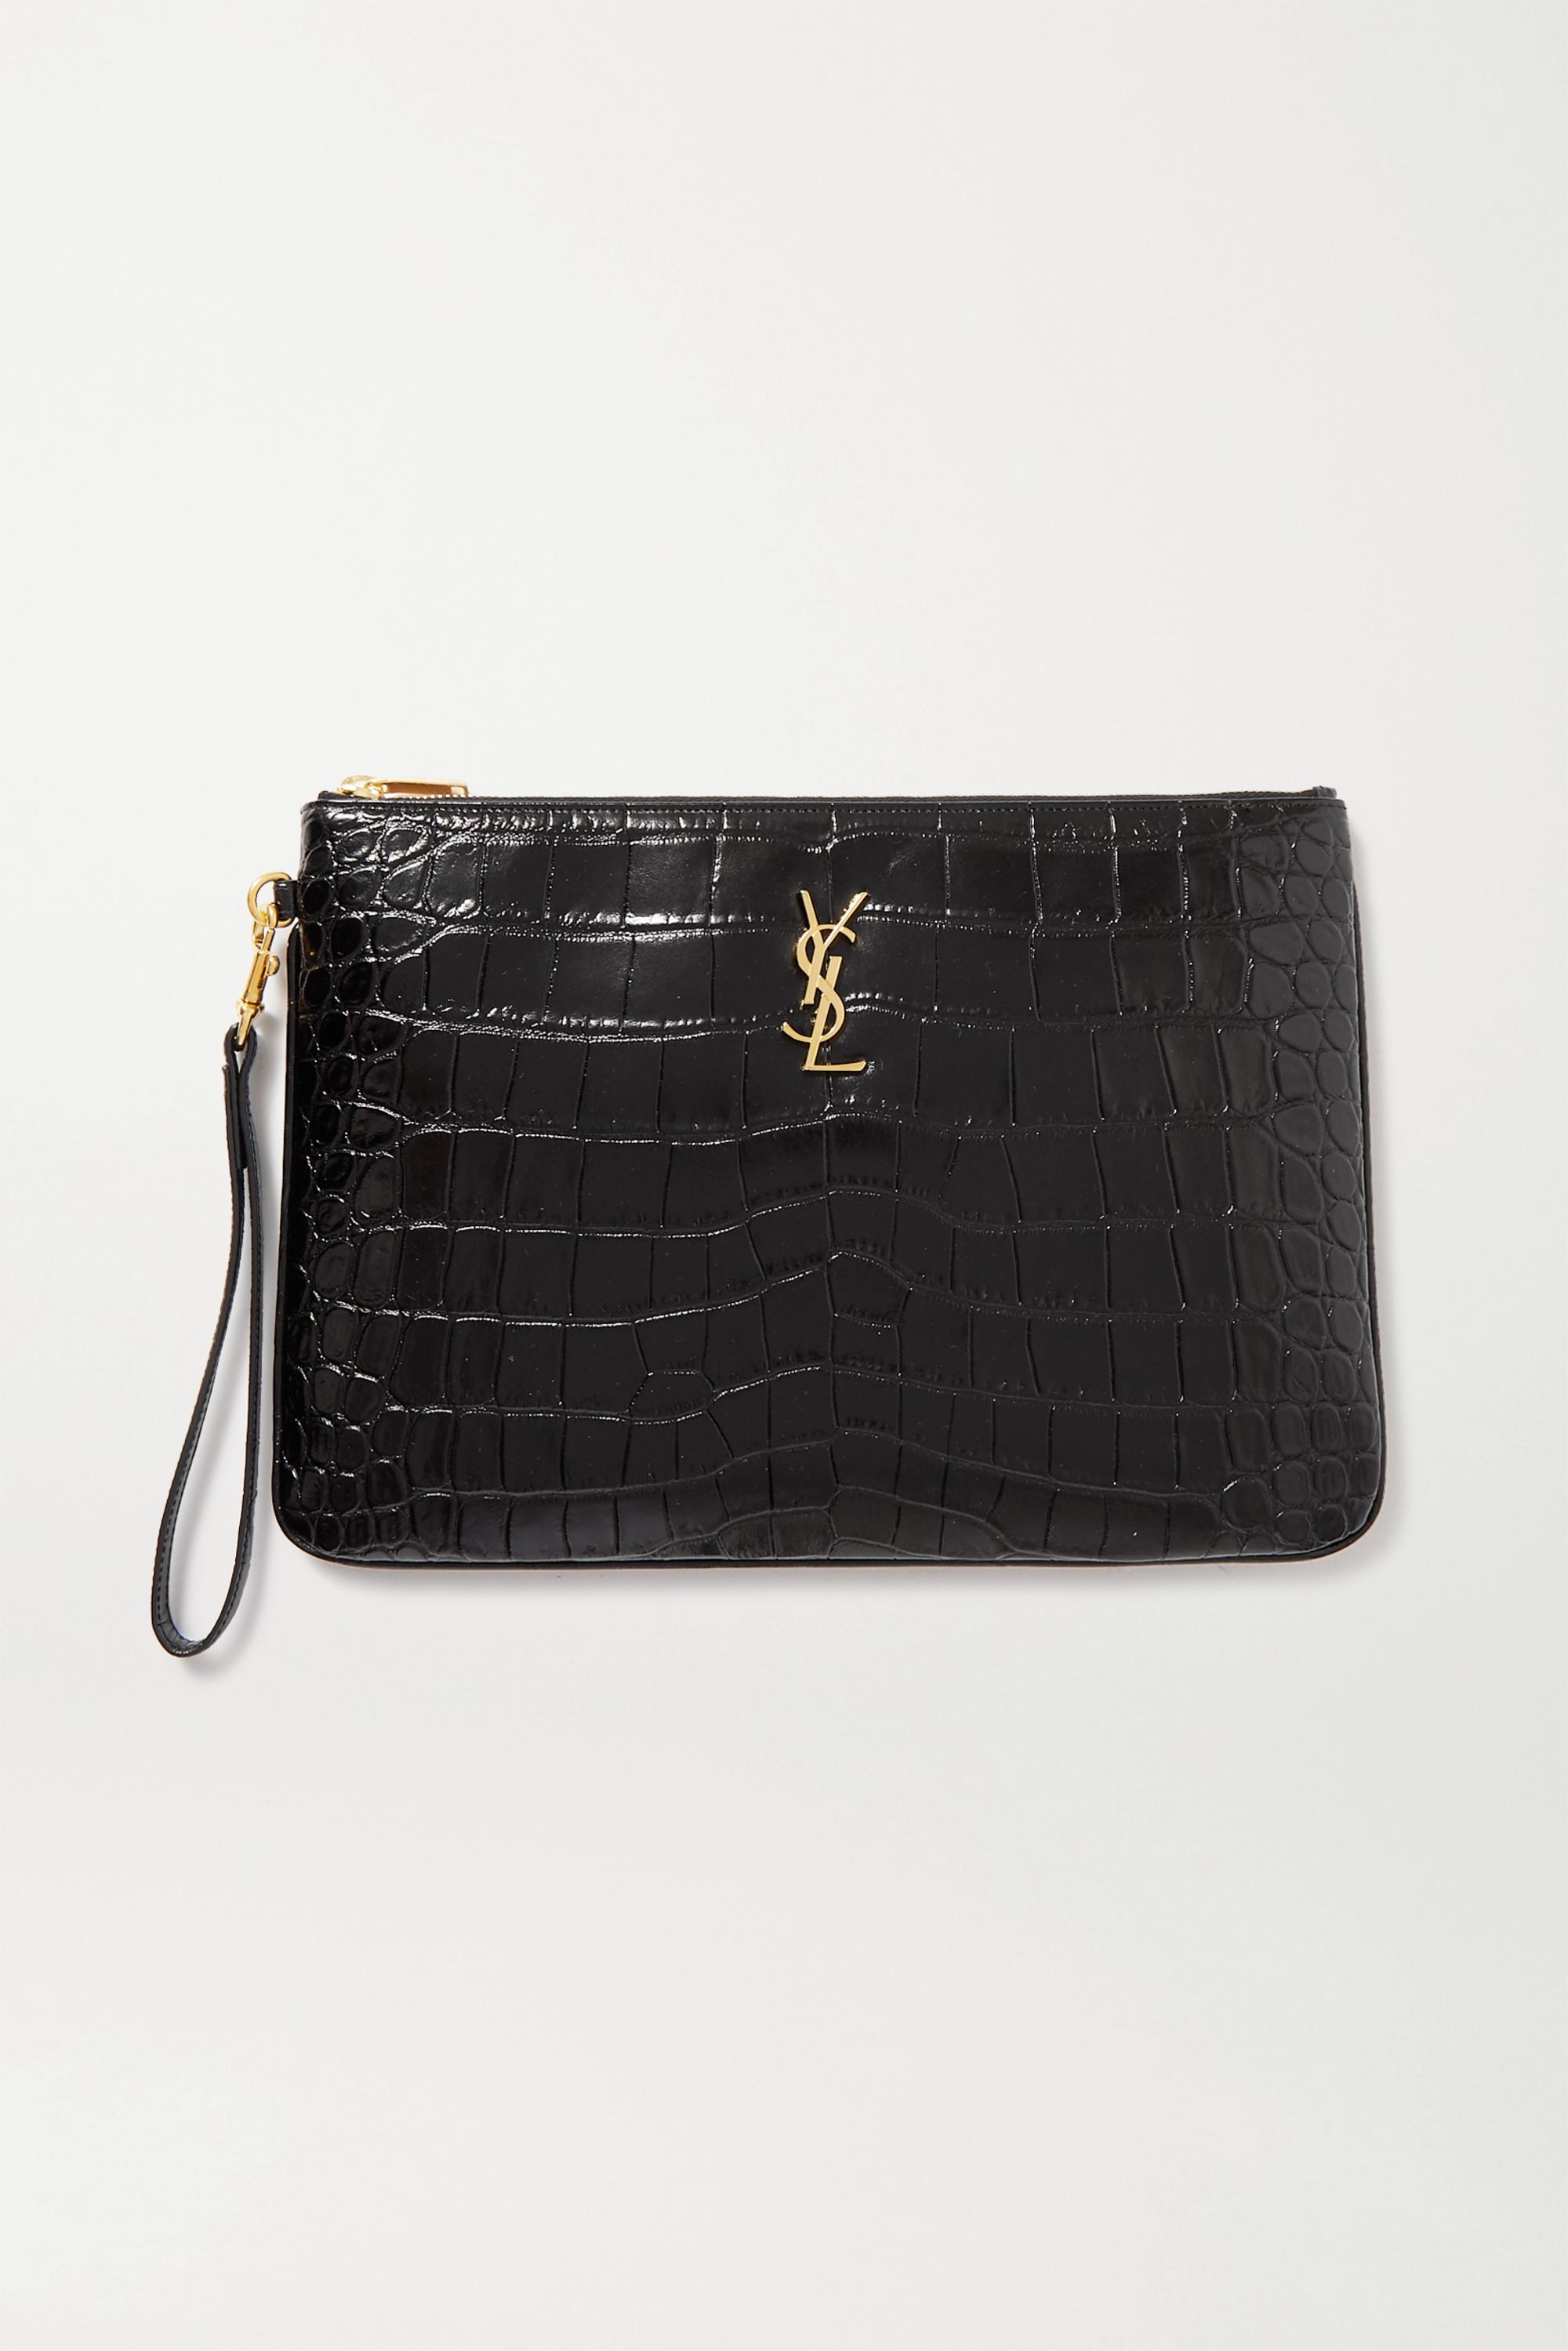 Crocodile Leather Pouch